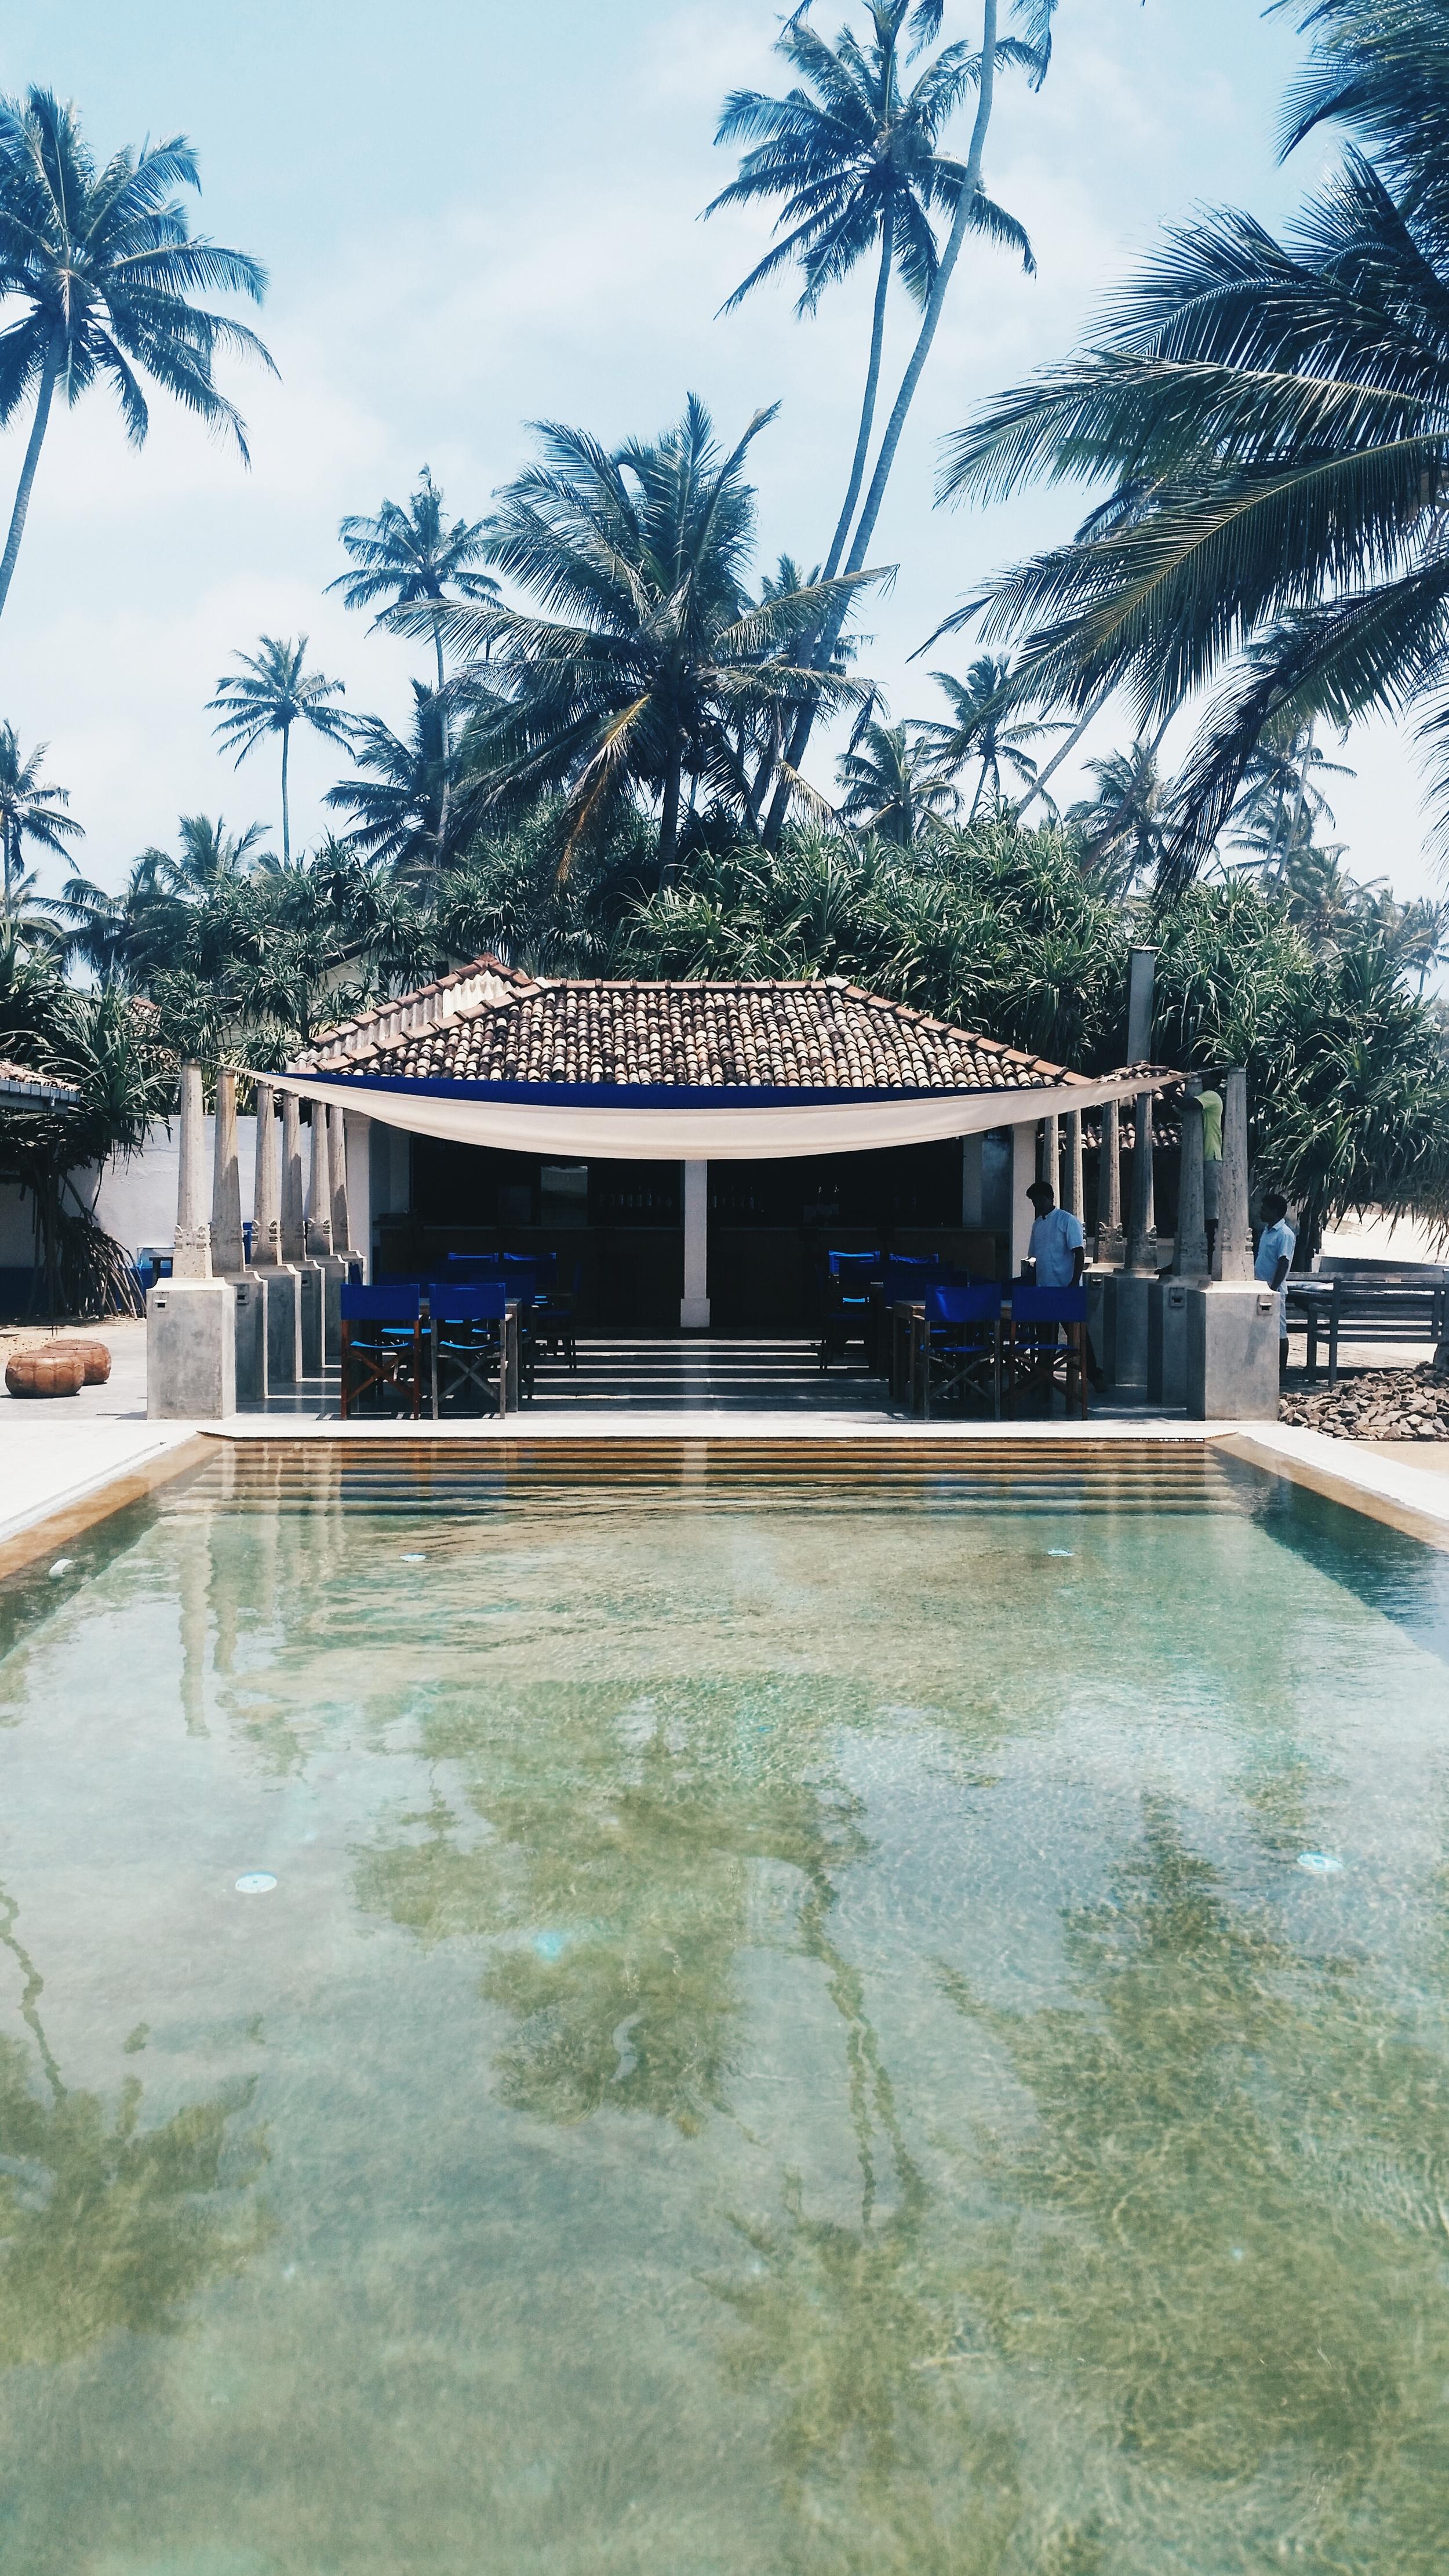 Talpe Beach Restaurant and Bar